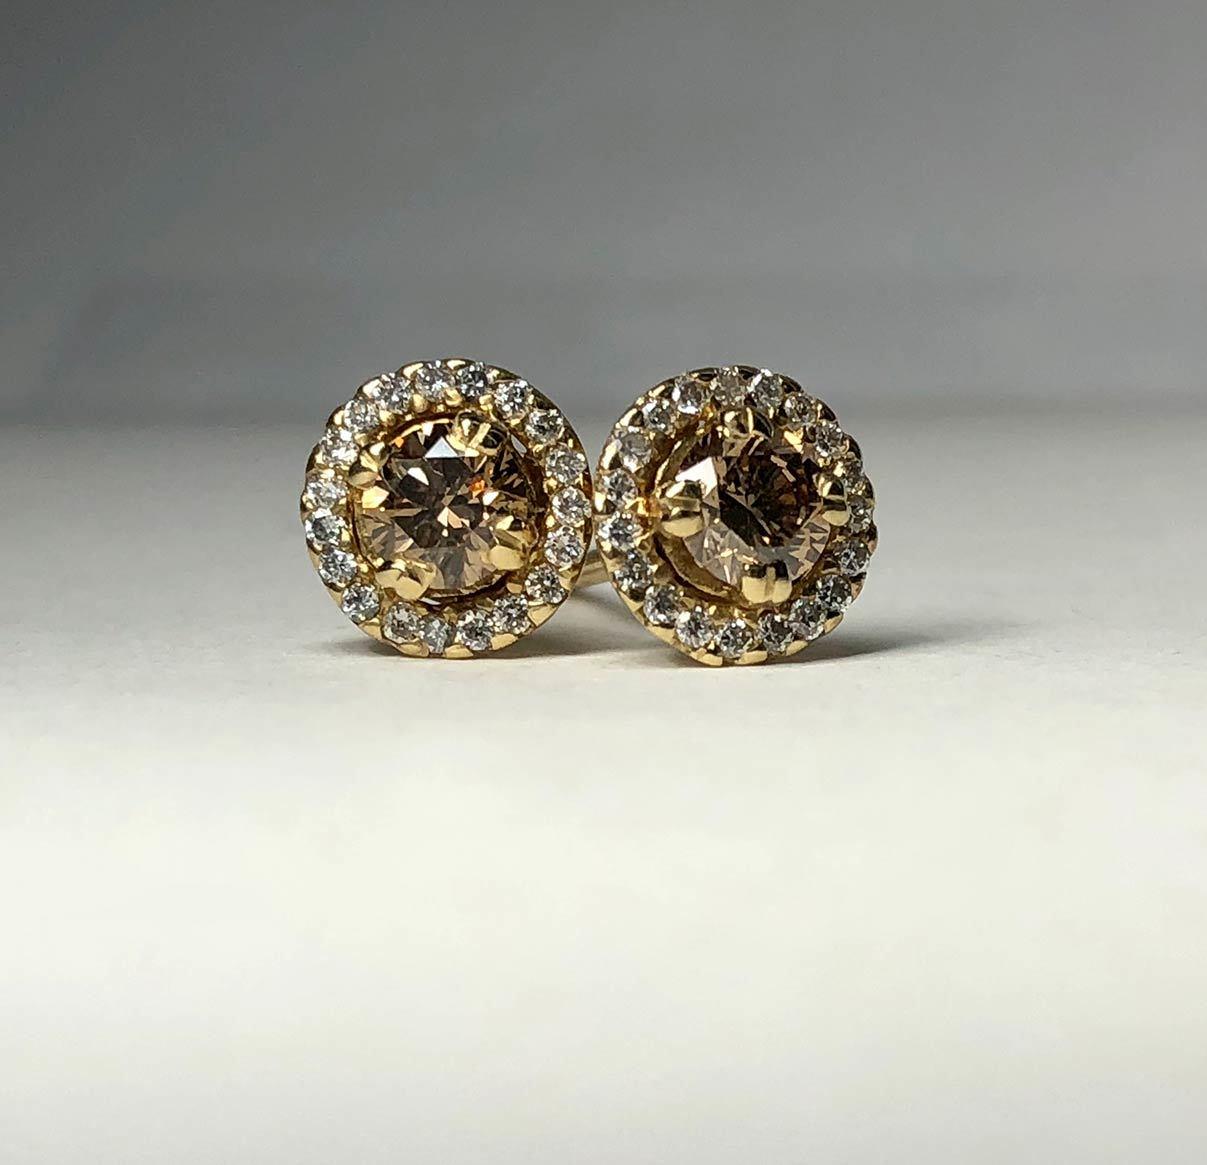 14K Yellow Gold 1.24tcw Diamonds Halo Design Earrings I-12957